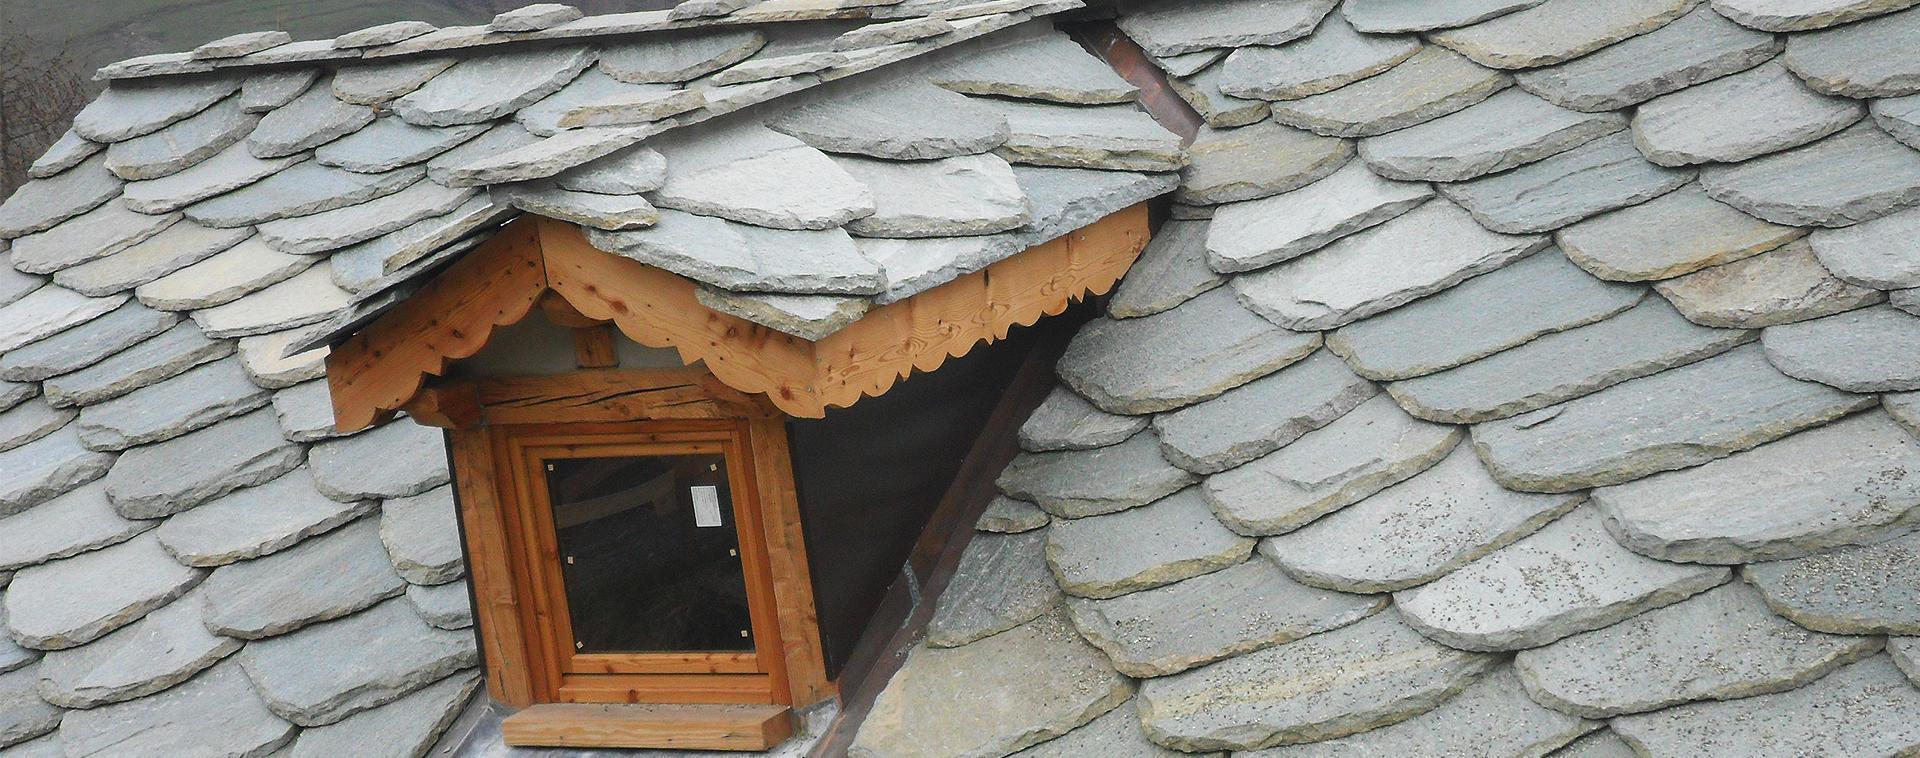 tettoia in pietra